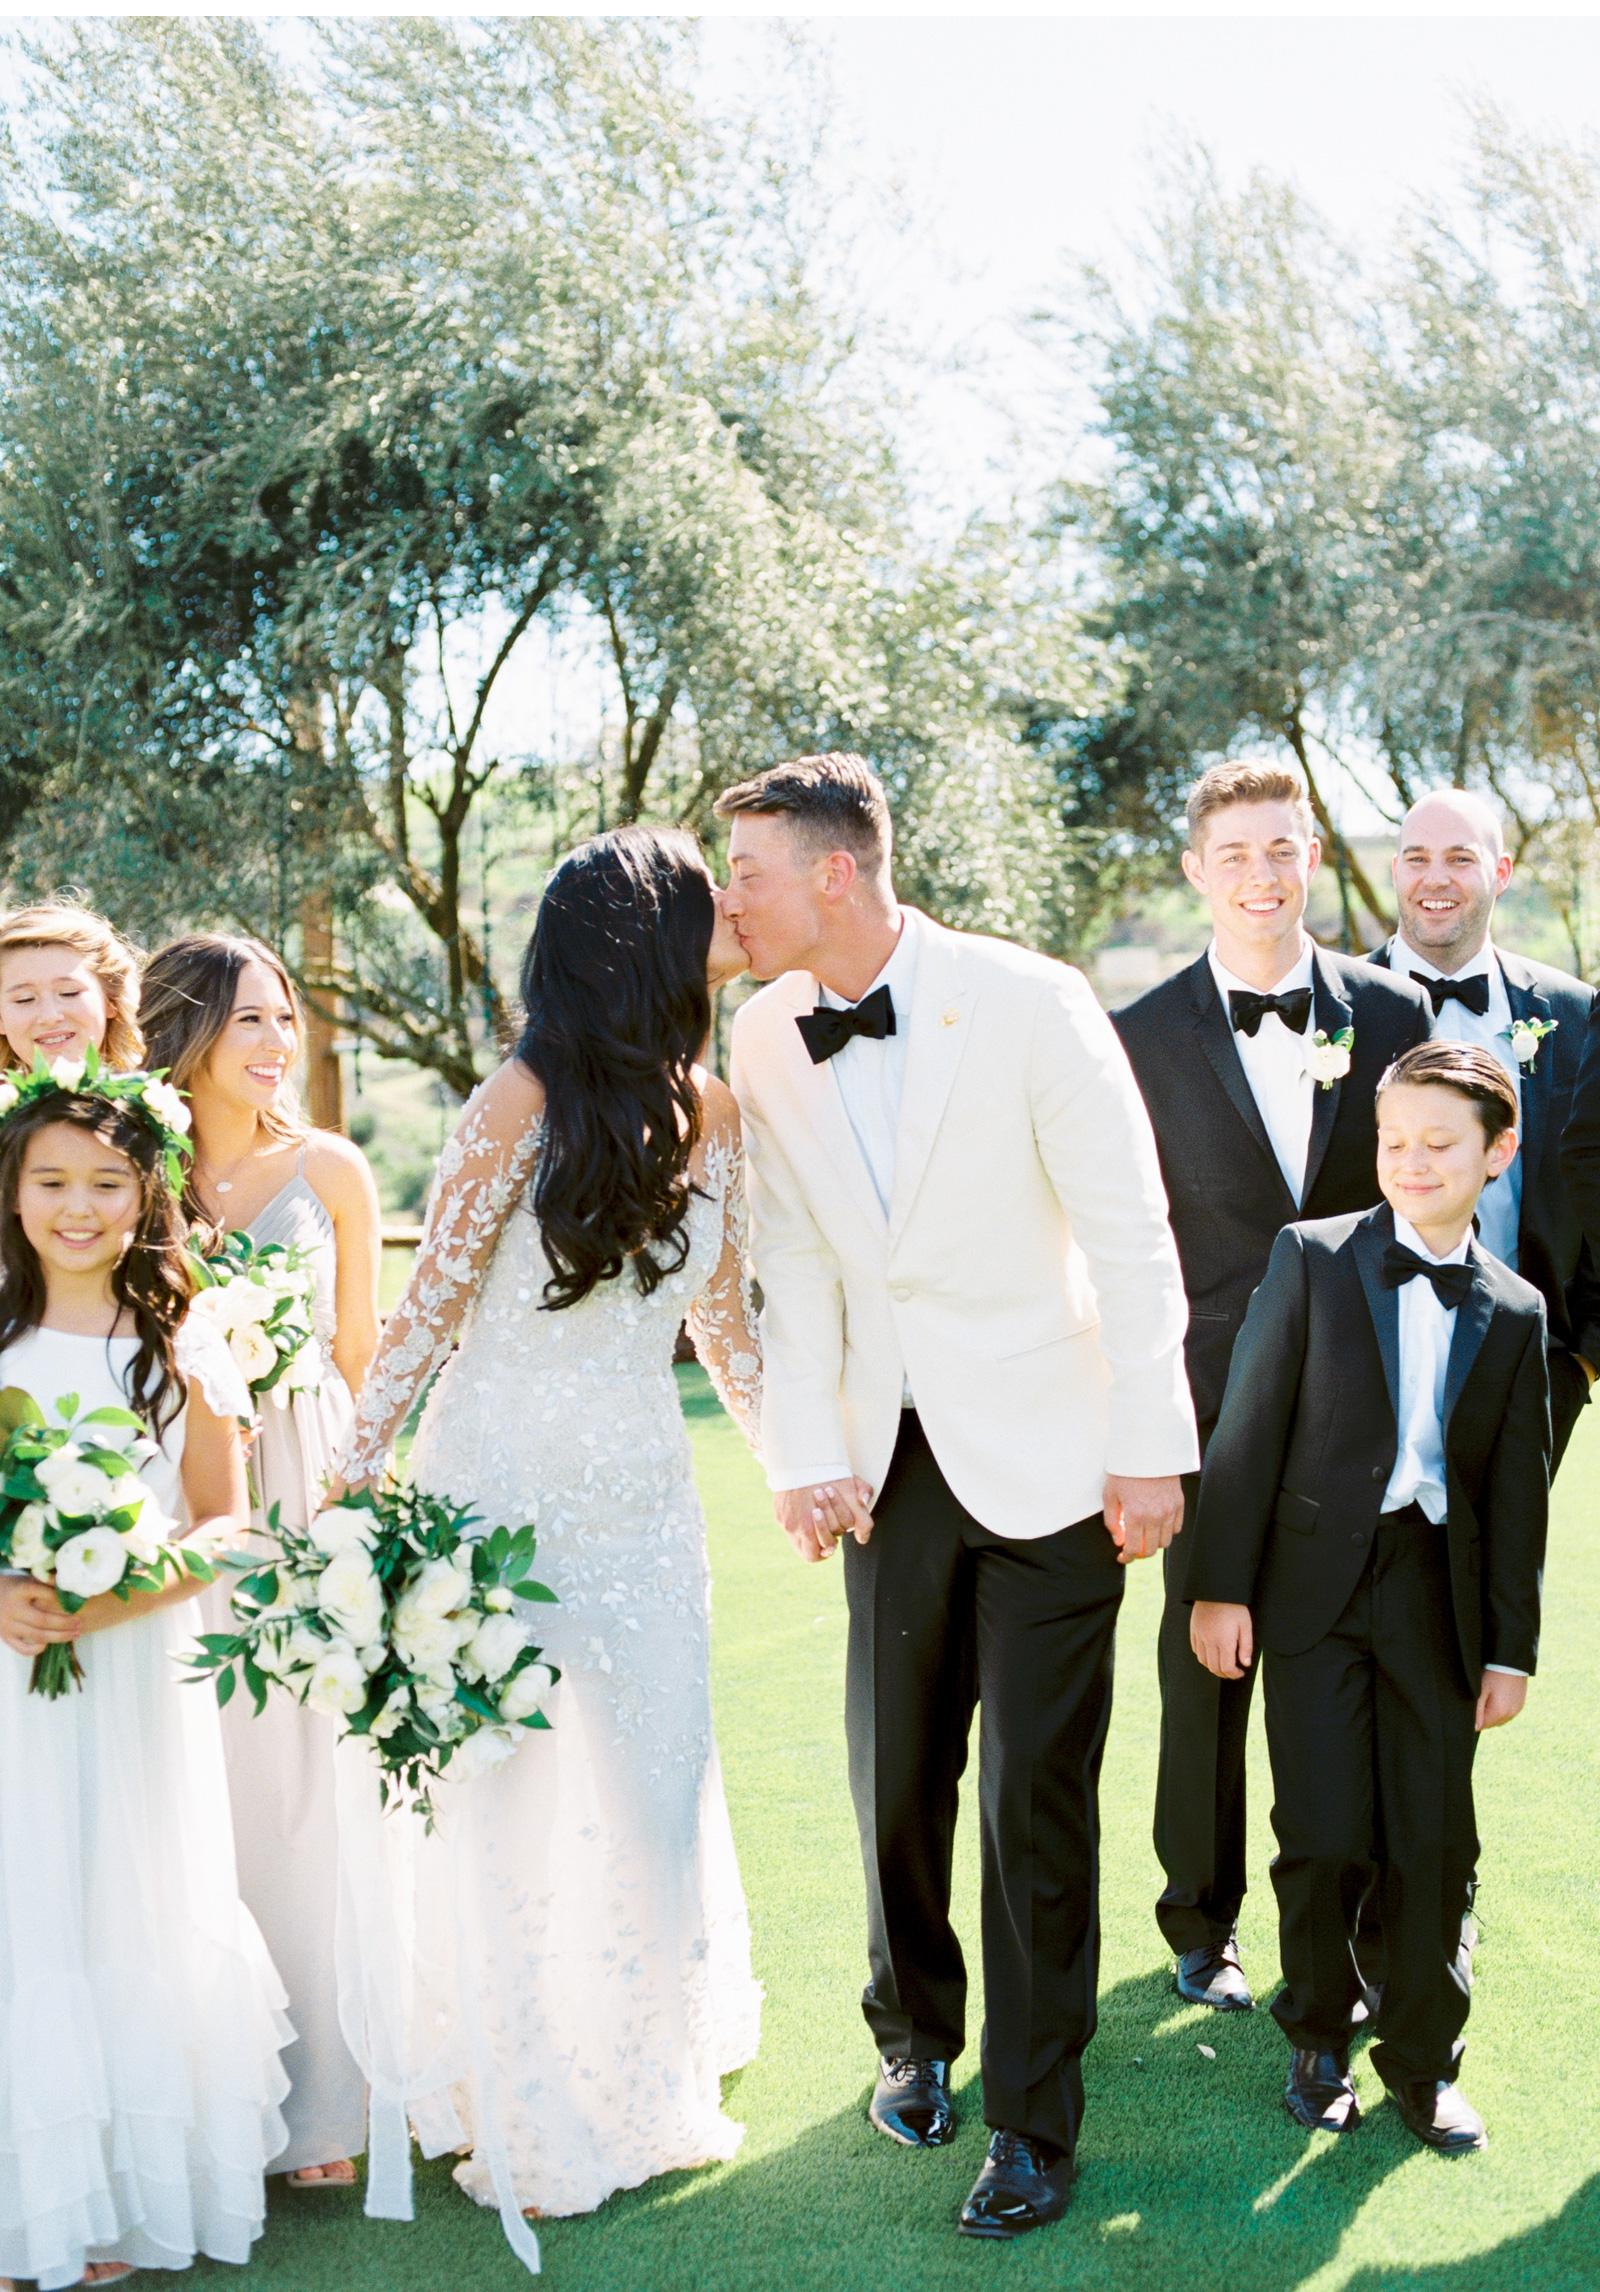 Malibu Wedding Venues.Levi Amelia S Malibu Wedding Natalie Schutt Photography